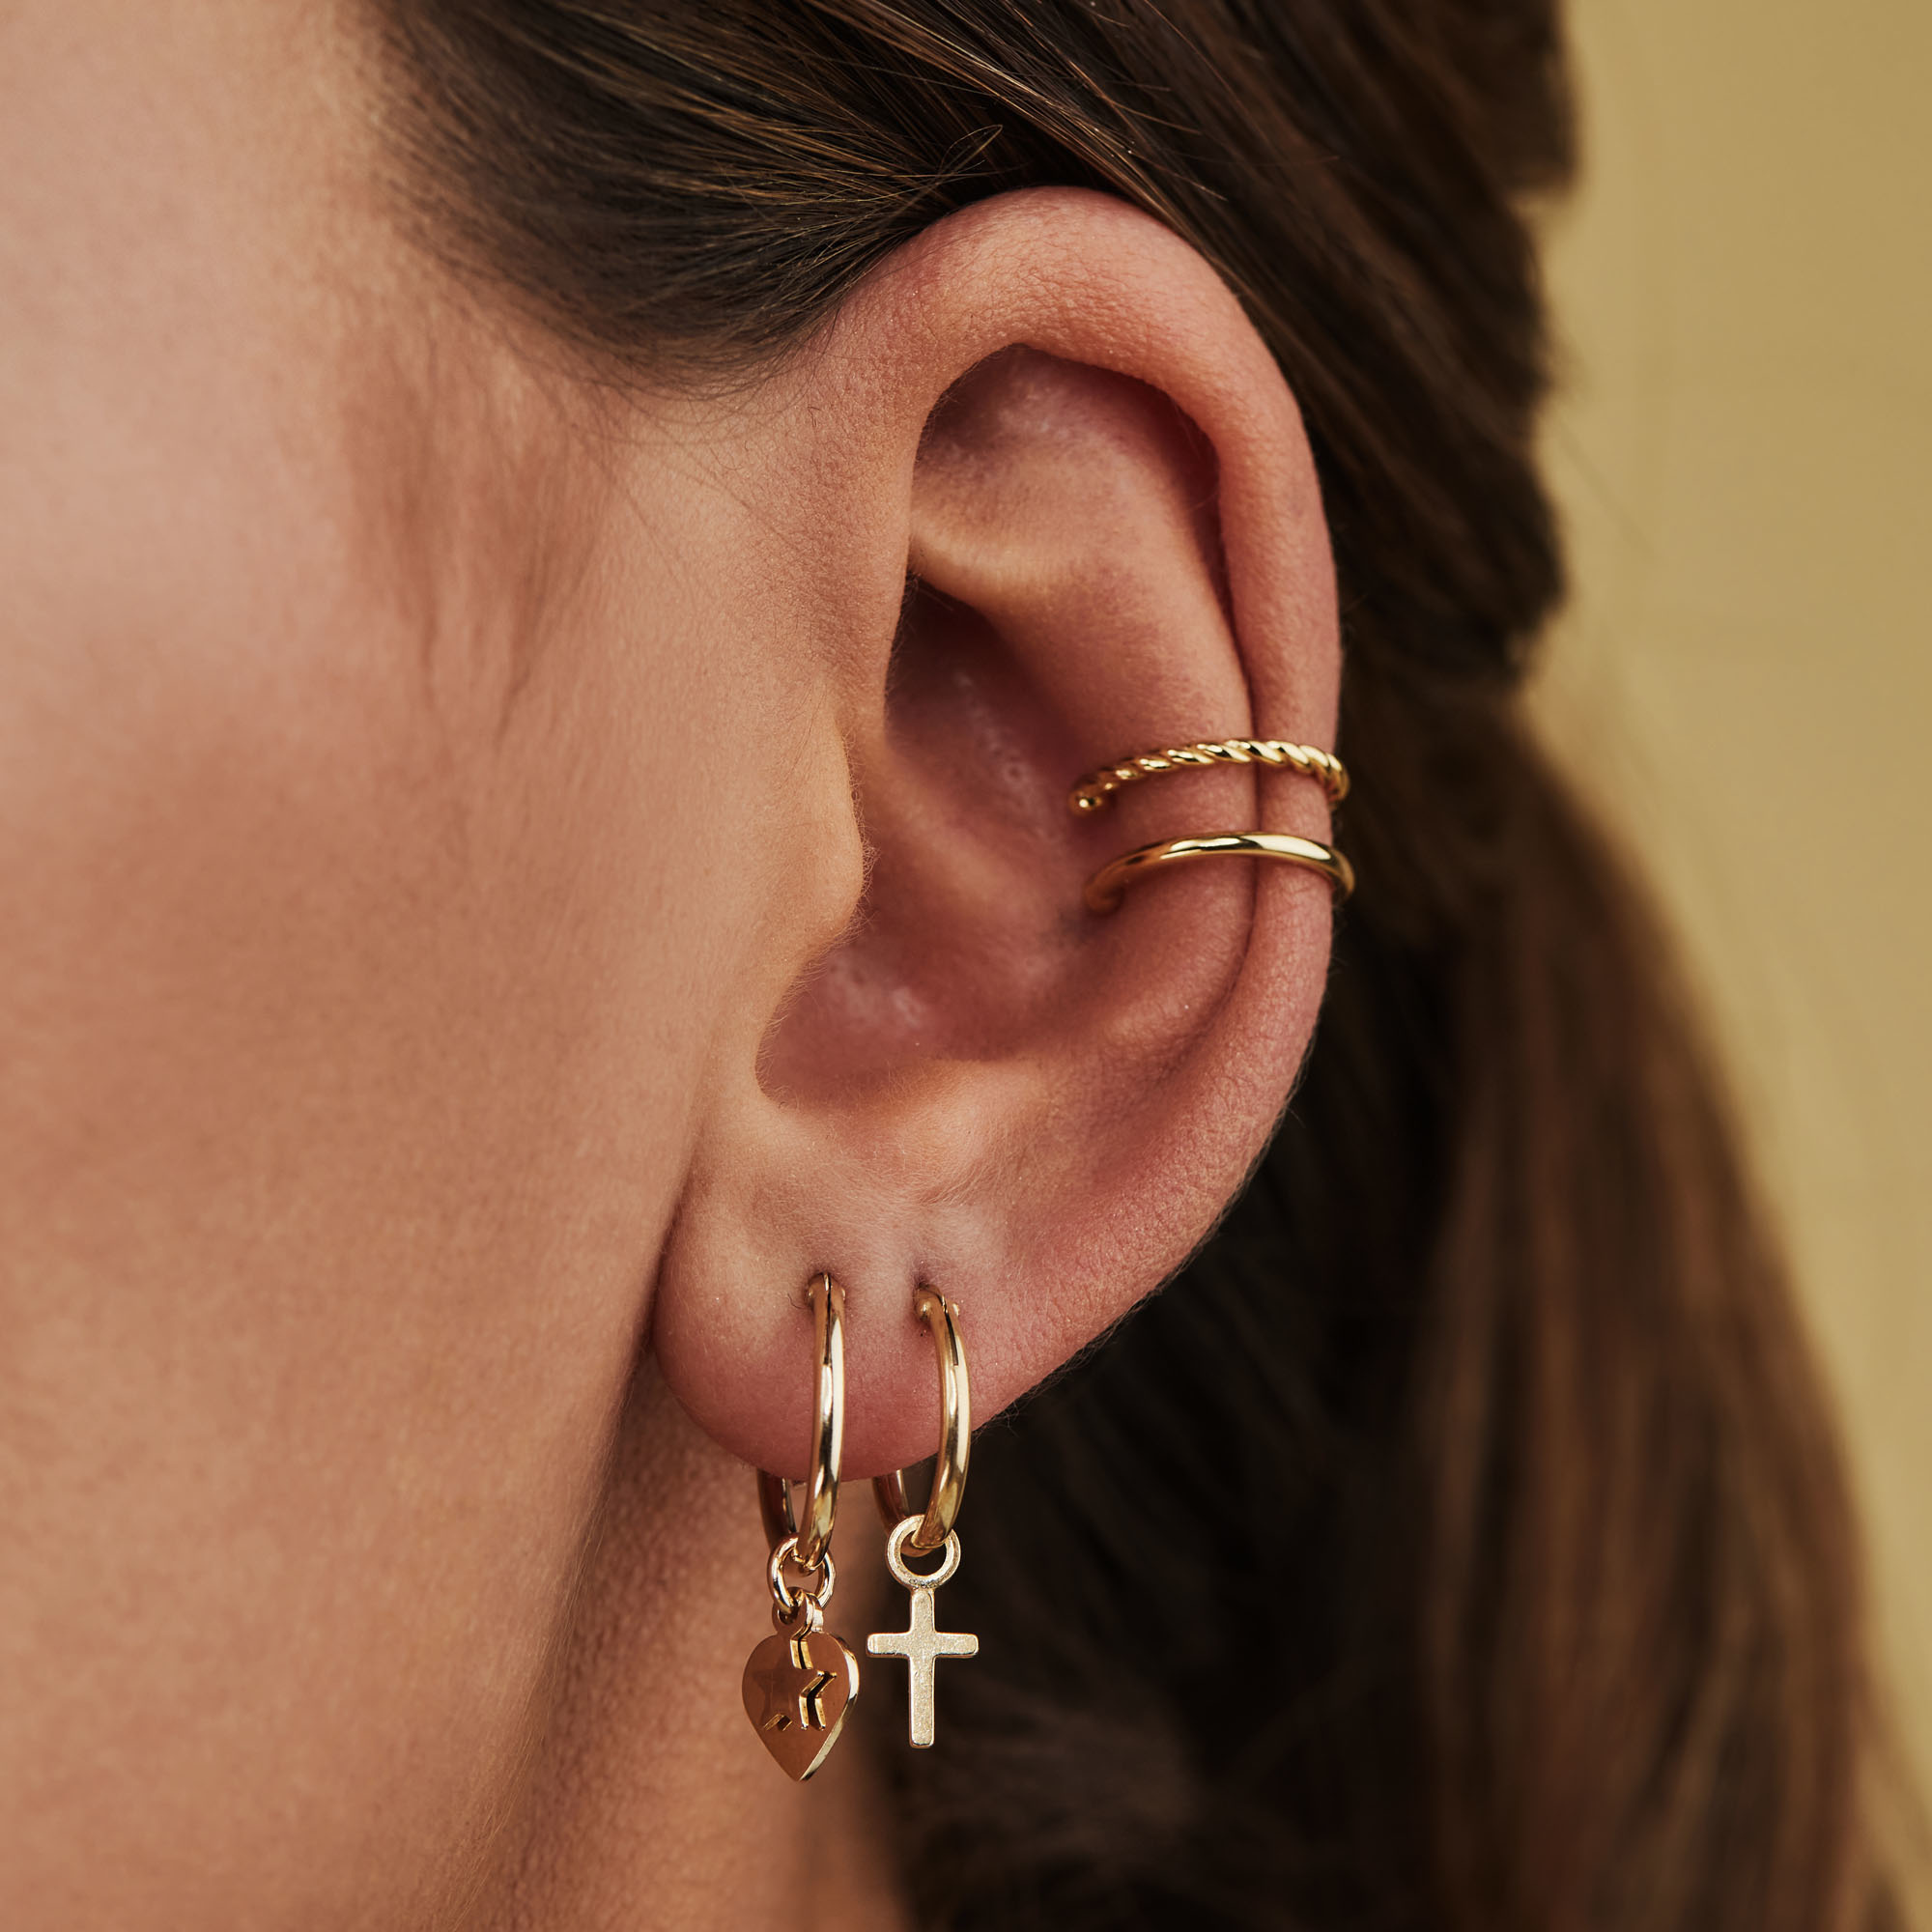 Selected Jewels Julie Théa 925 sterling silver gold colored hoop earrings with crosses